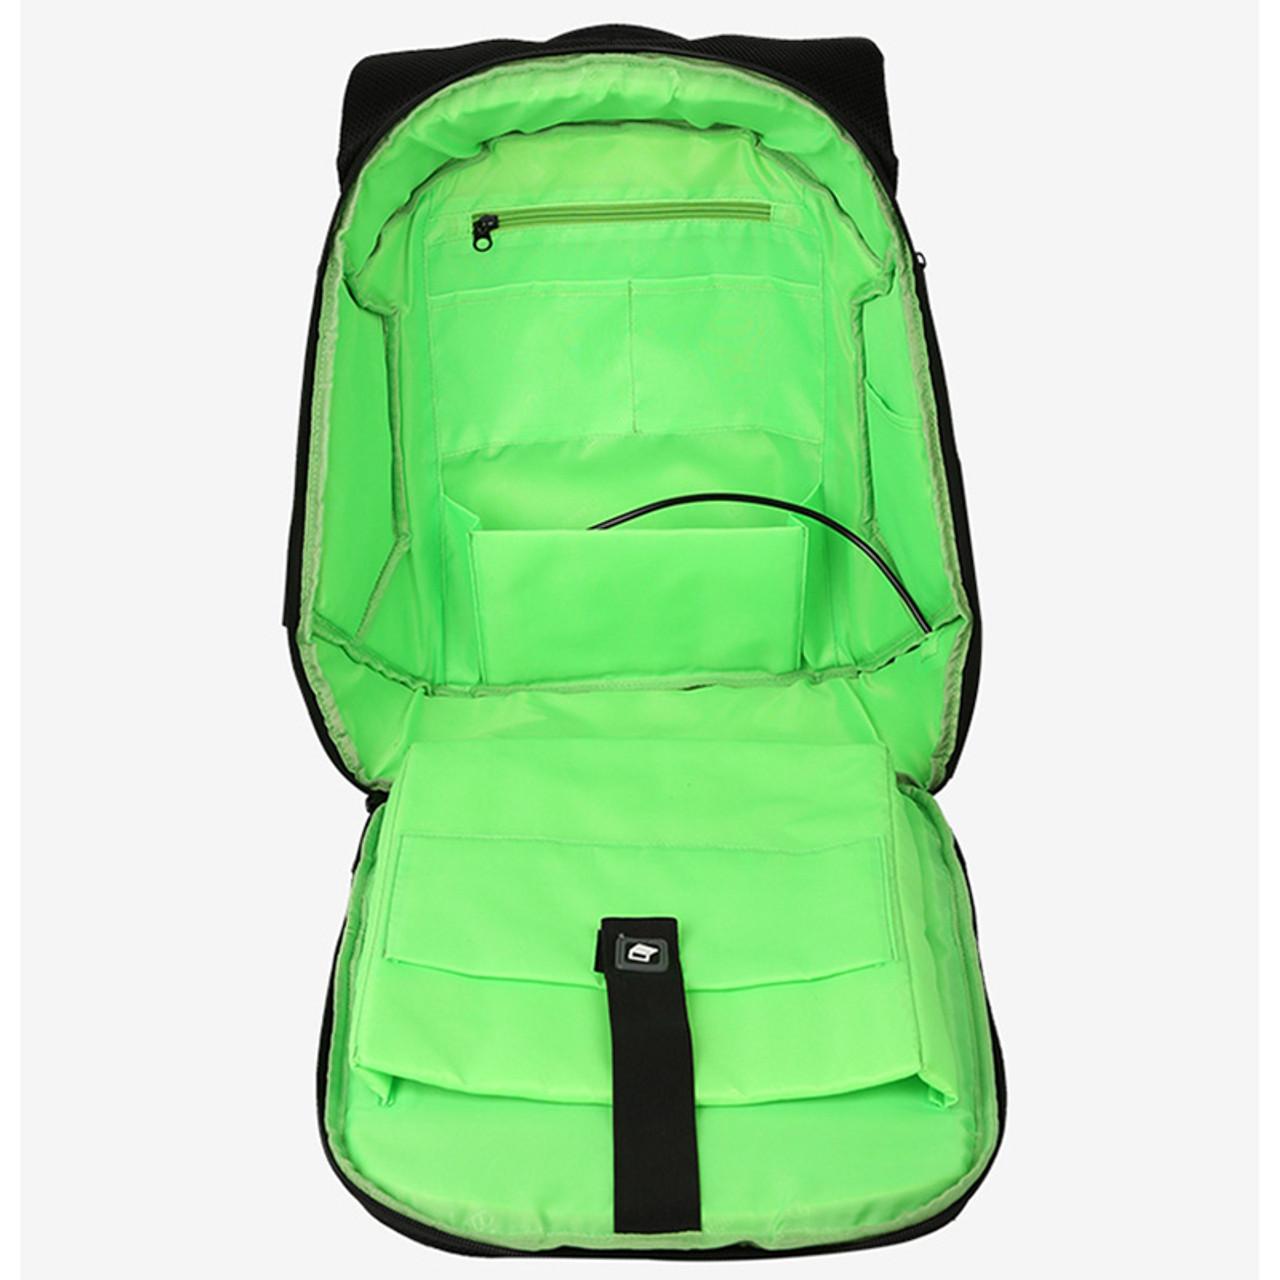 6d4bfe5721 ... BAIBU NEW Men 15.6 Laptop Backpack Anti Theft Backpack Usb Charging  Women School Notebook Bag Oxford ...